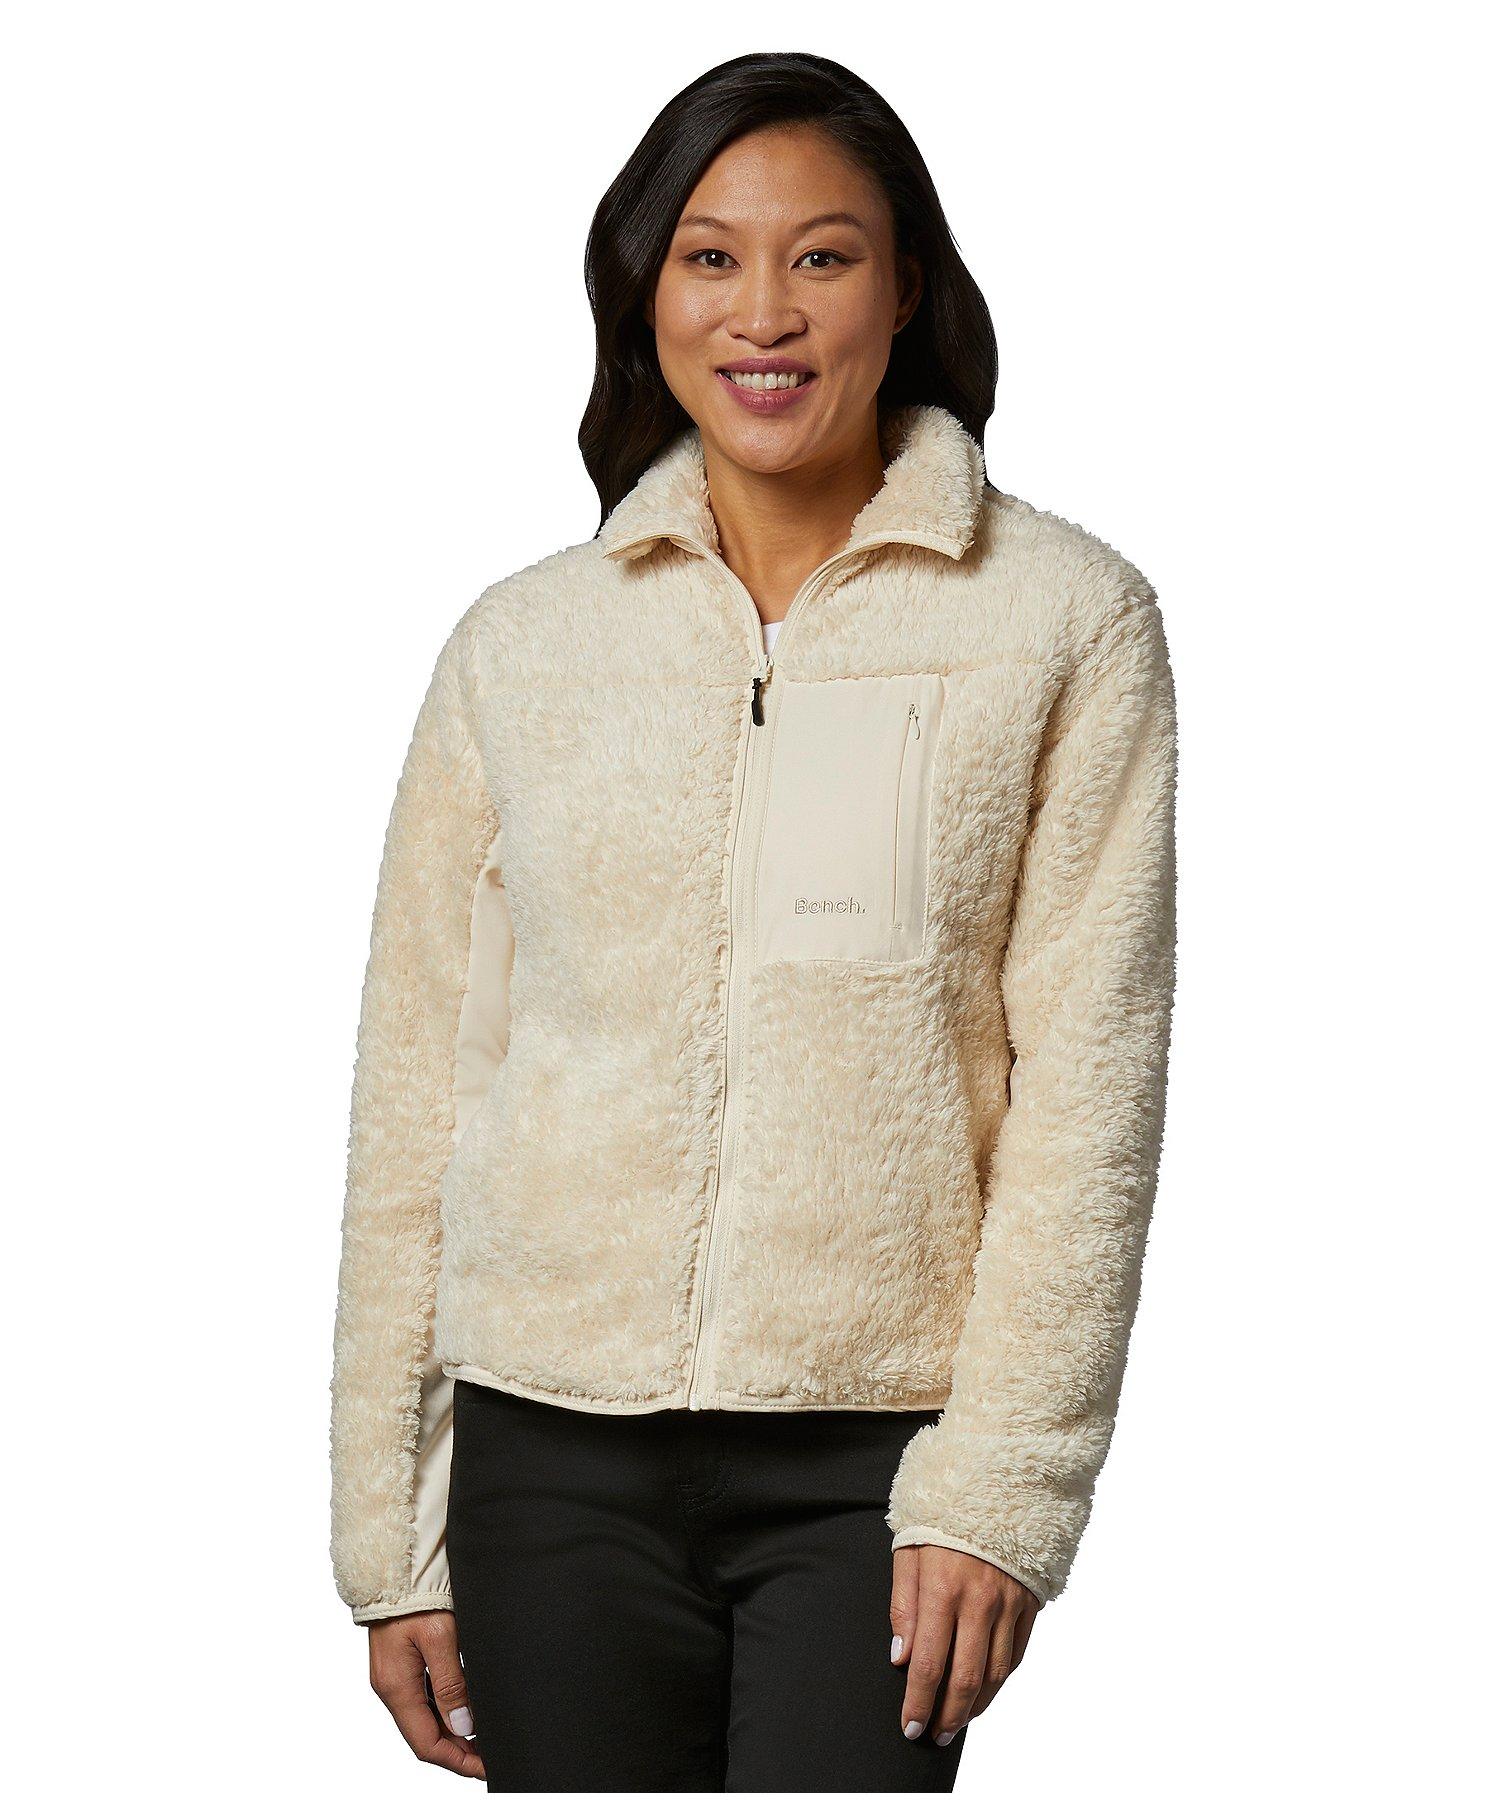 Stupendous Womens Sherpa Jacket With Pocket Ibusinesslaw Wood Chair Design Ideas Ibusinesslaworg